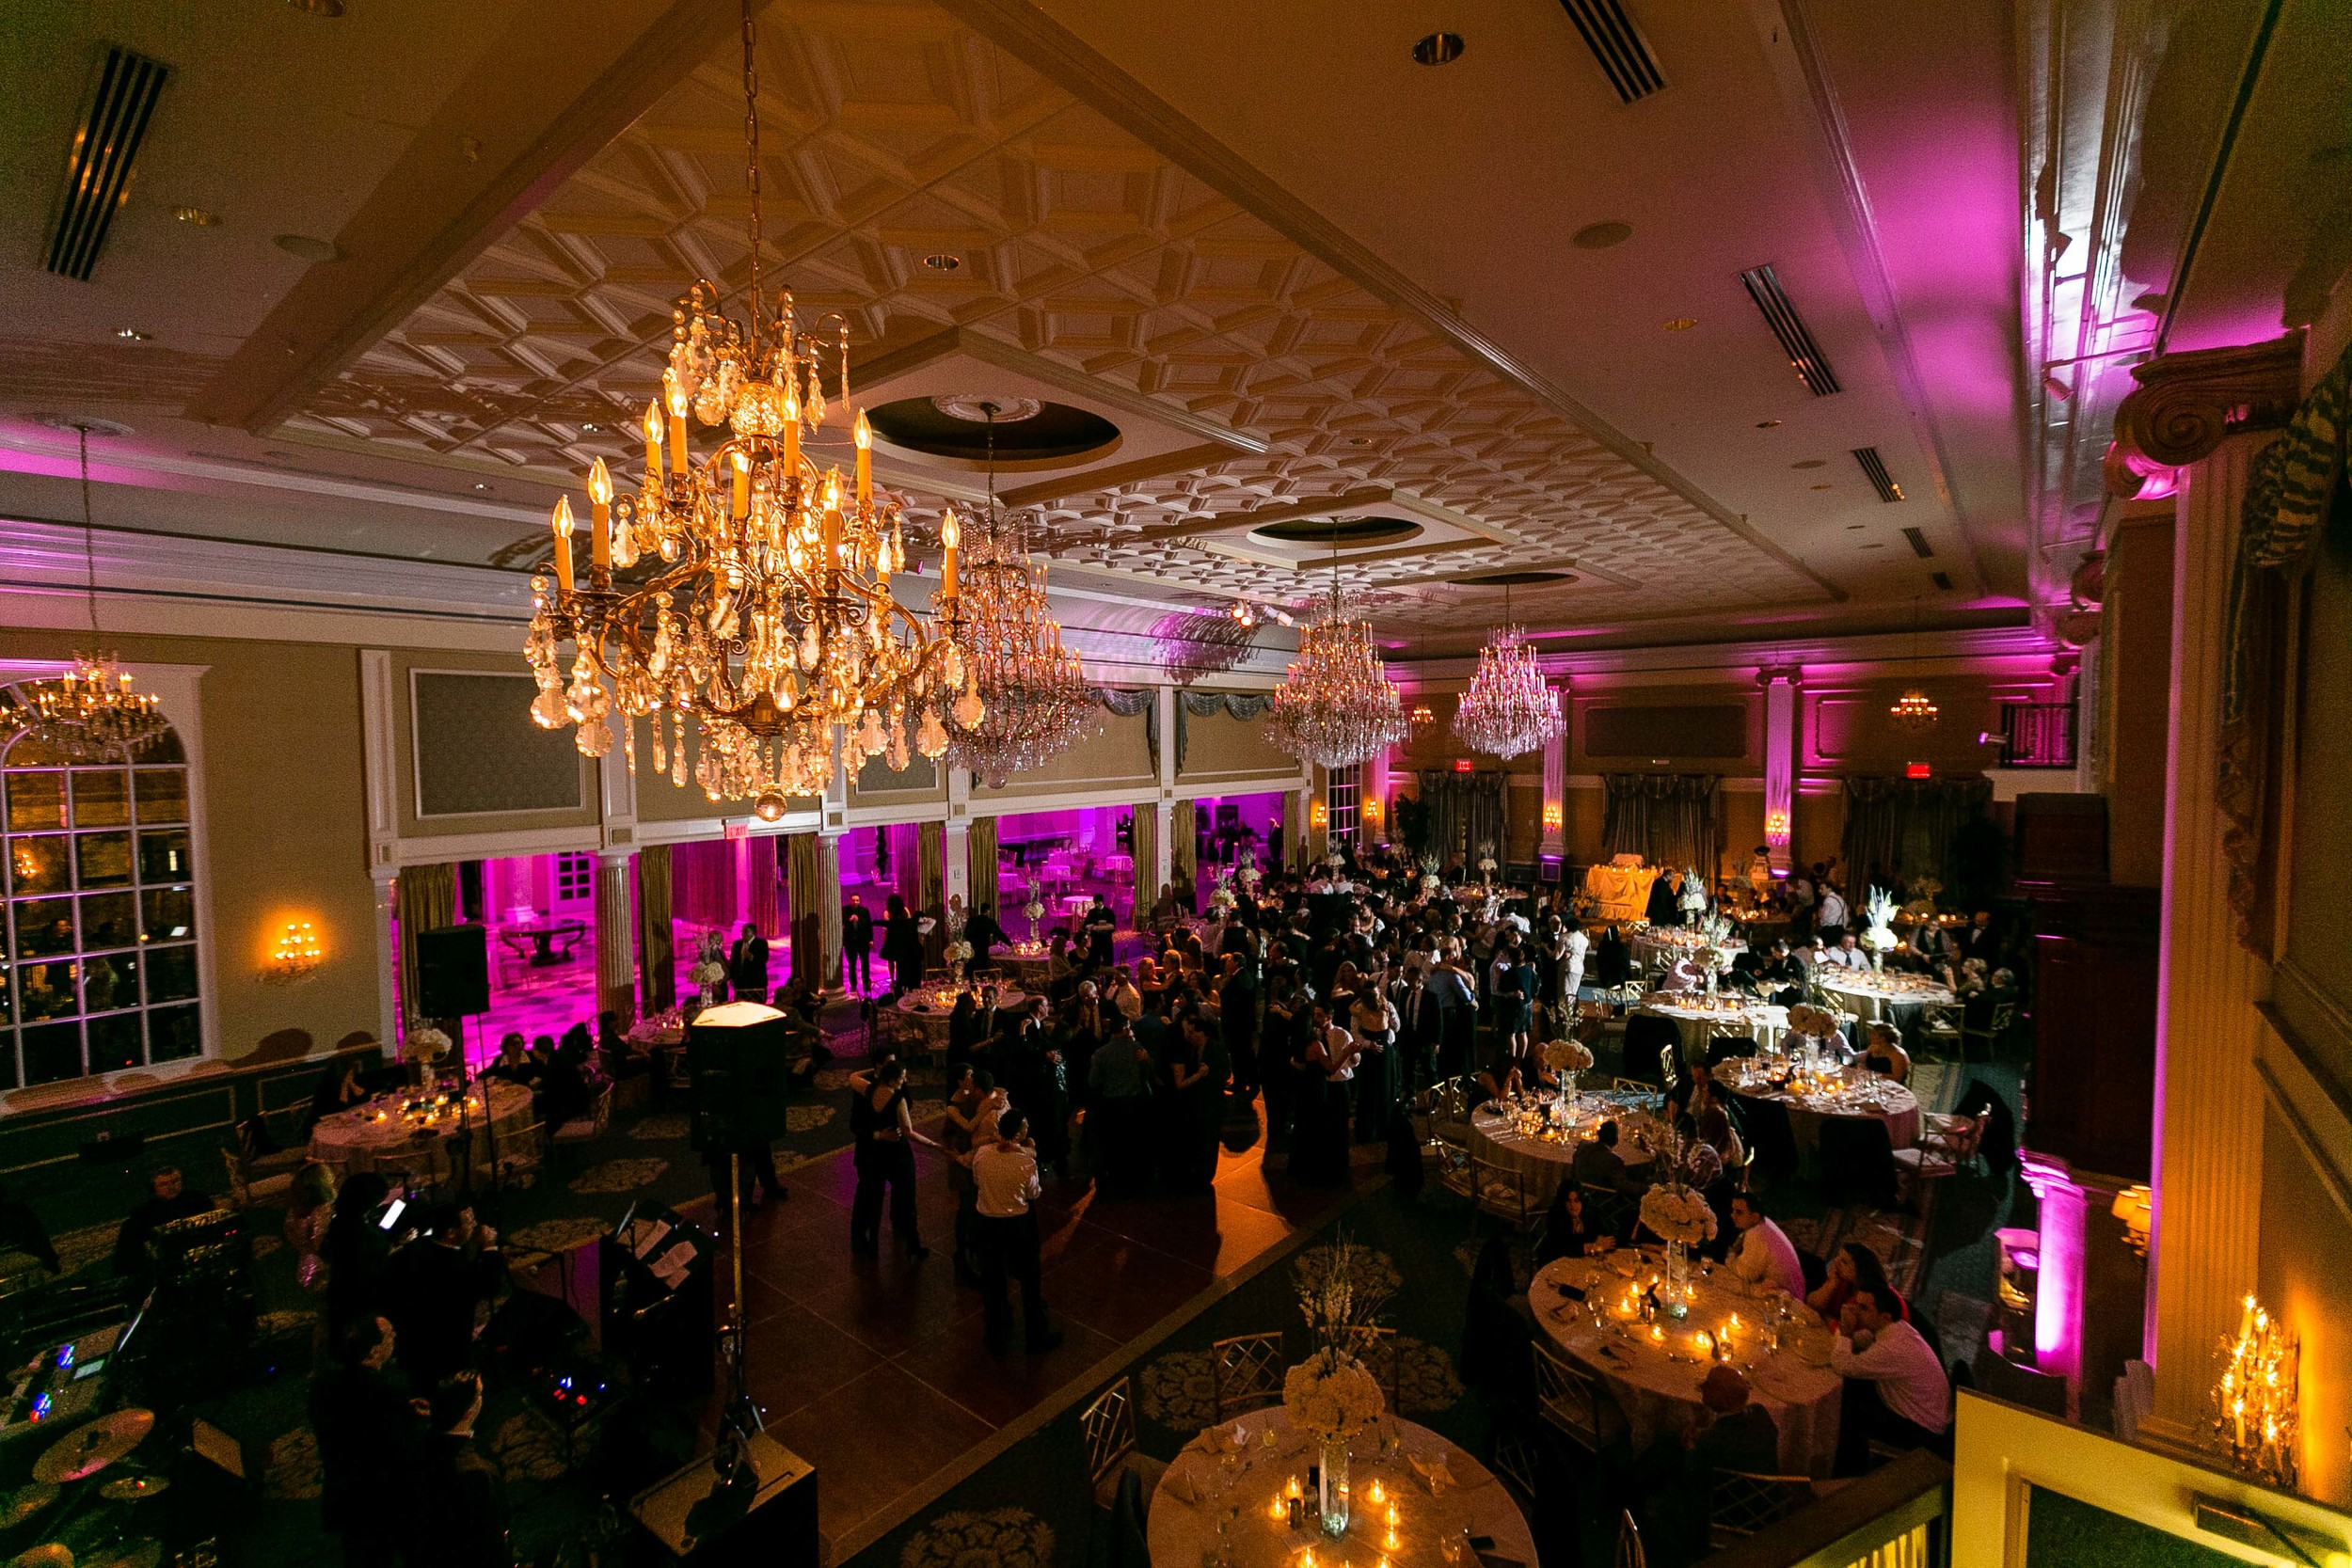 Russian-Jewish-Italian-Luxury-Wedding-The-Palace-at-Somerset-Park-NJ-Documentary-Wedding-Photography-14.jpg